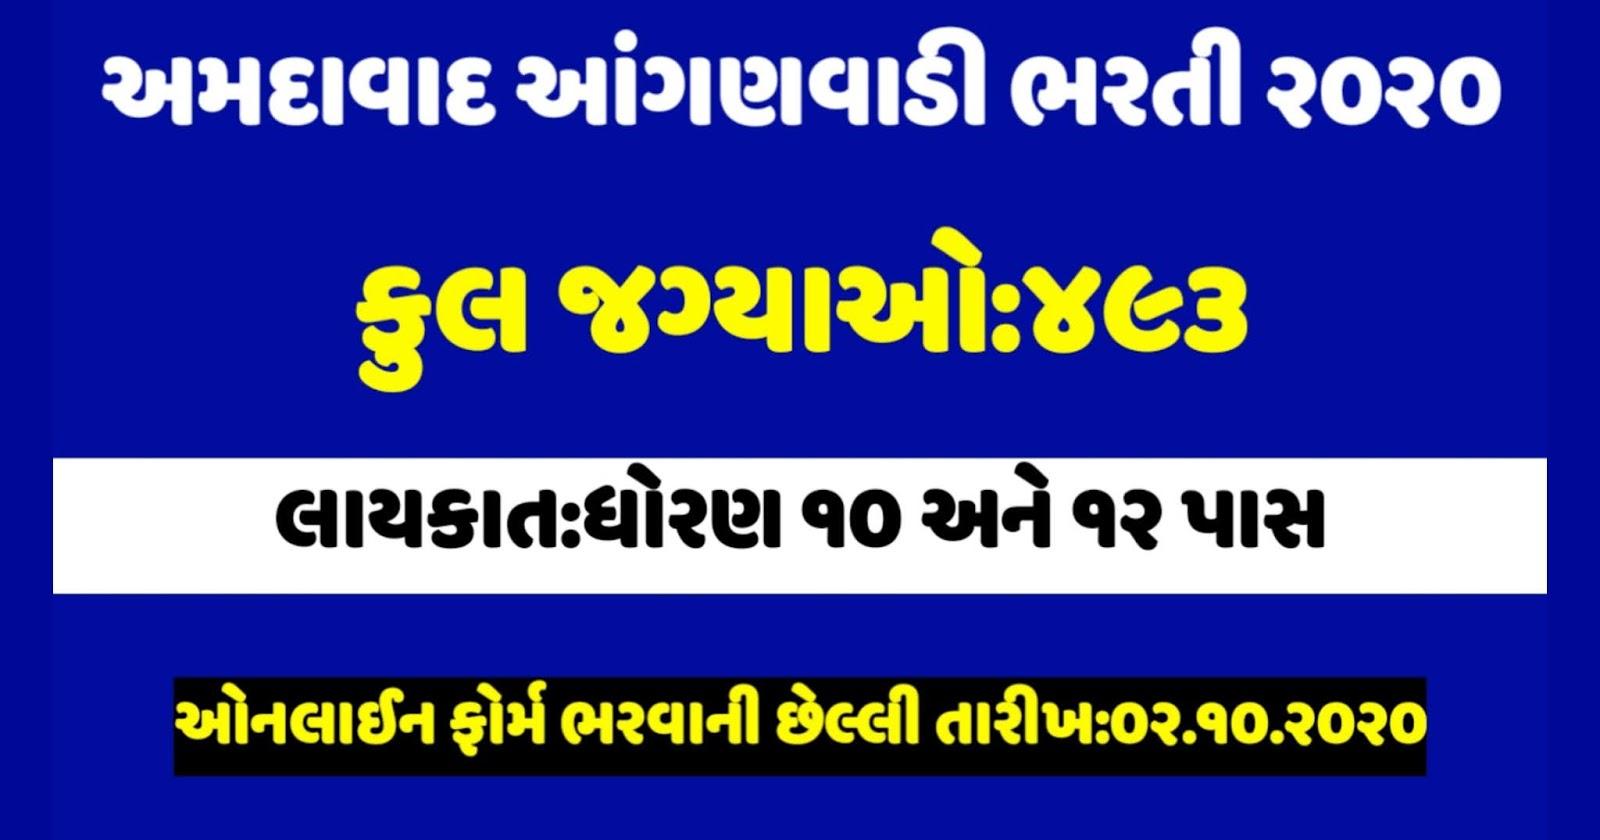 Ahemdabad Anganwadi 493 Worker And Helper Posts Recruitment 2020